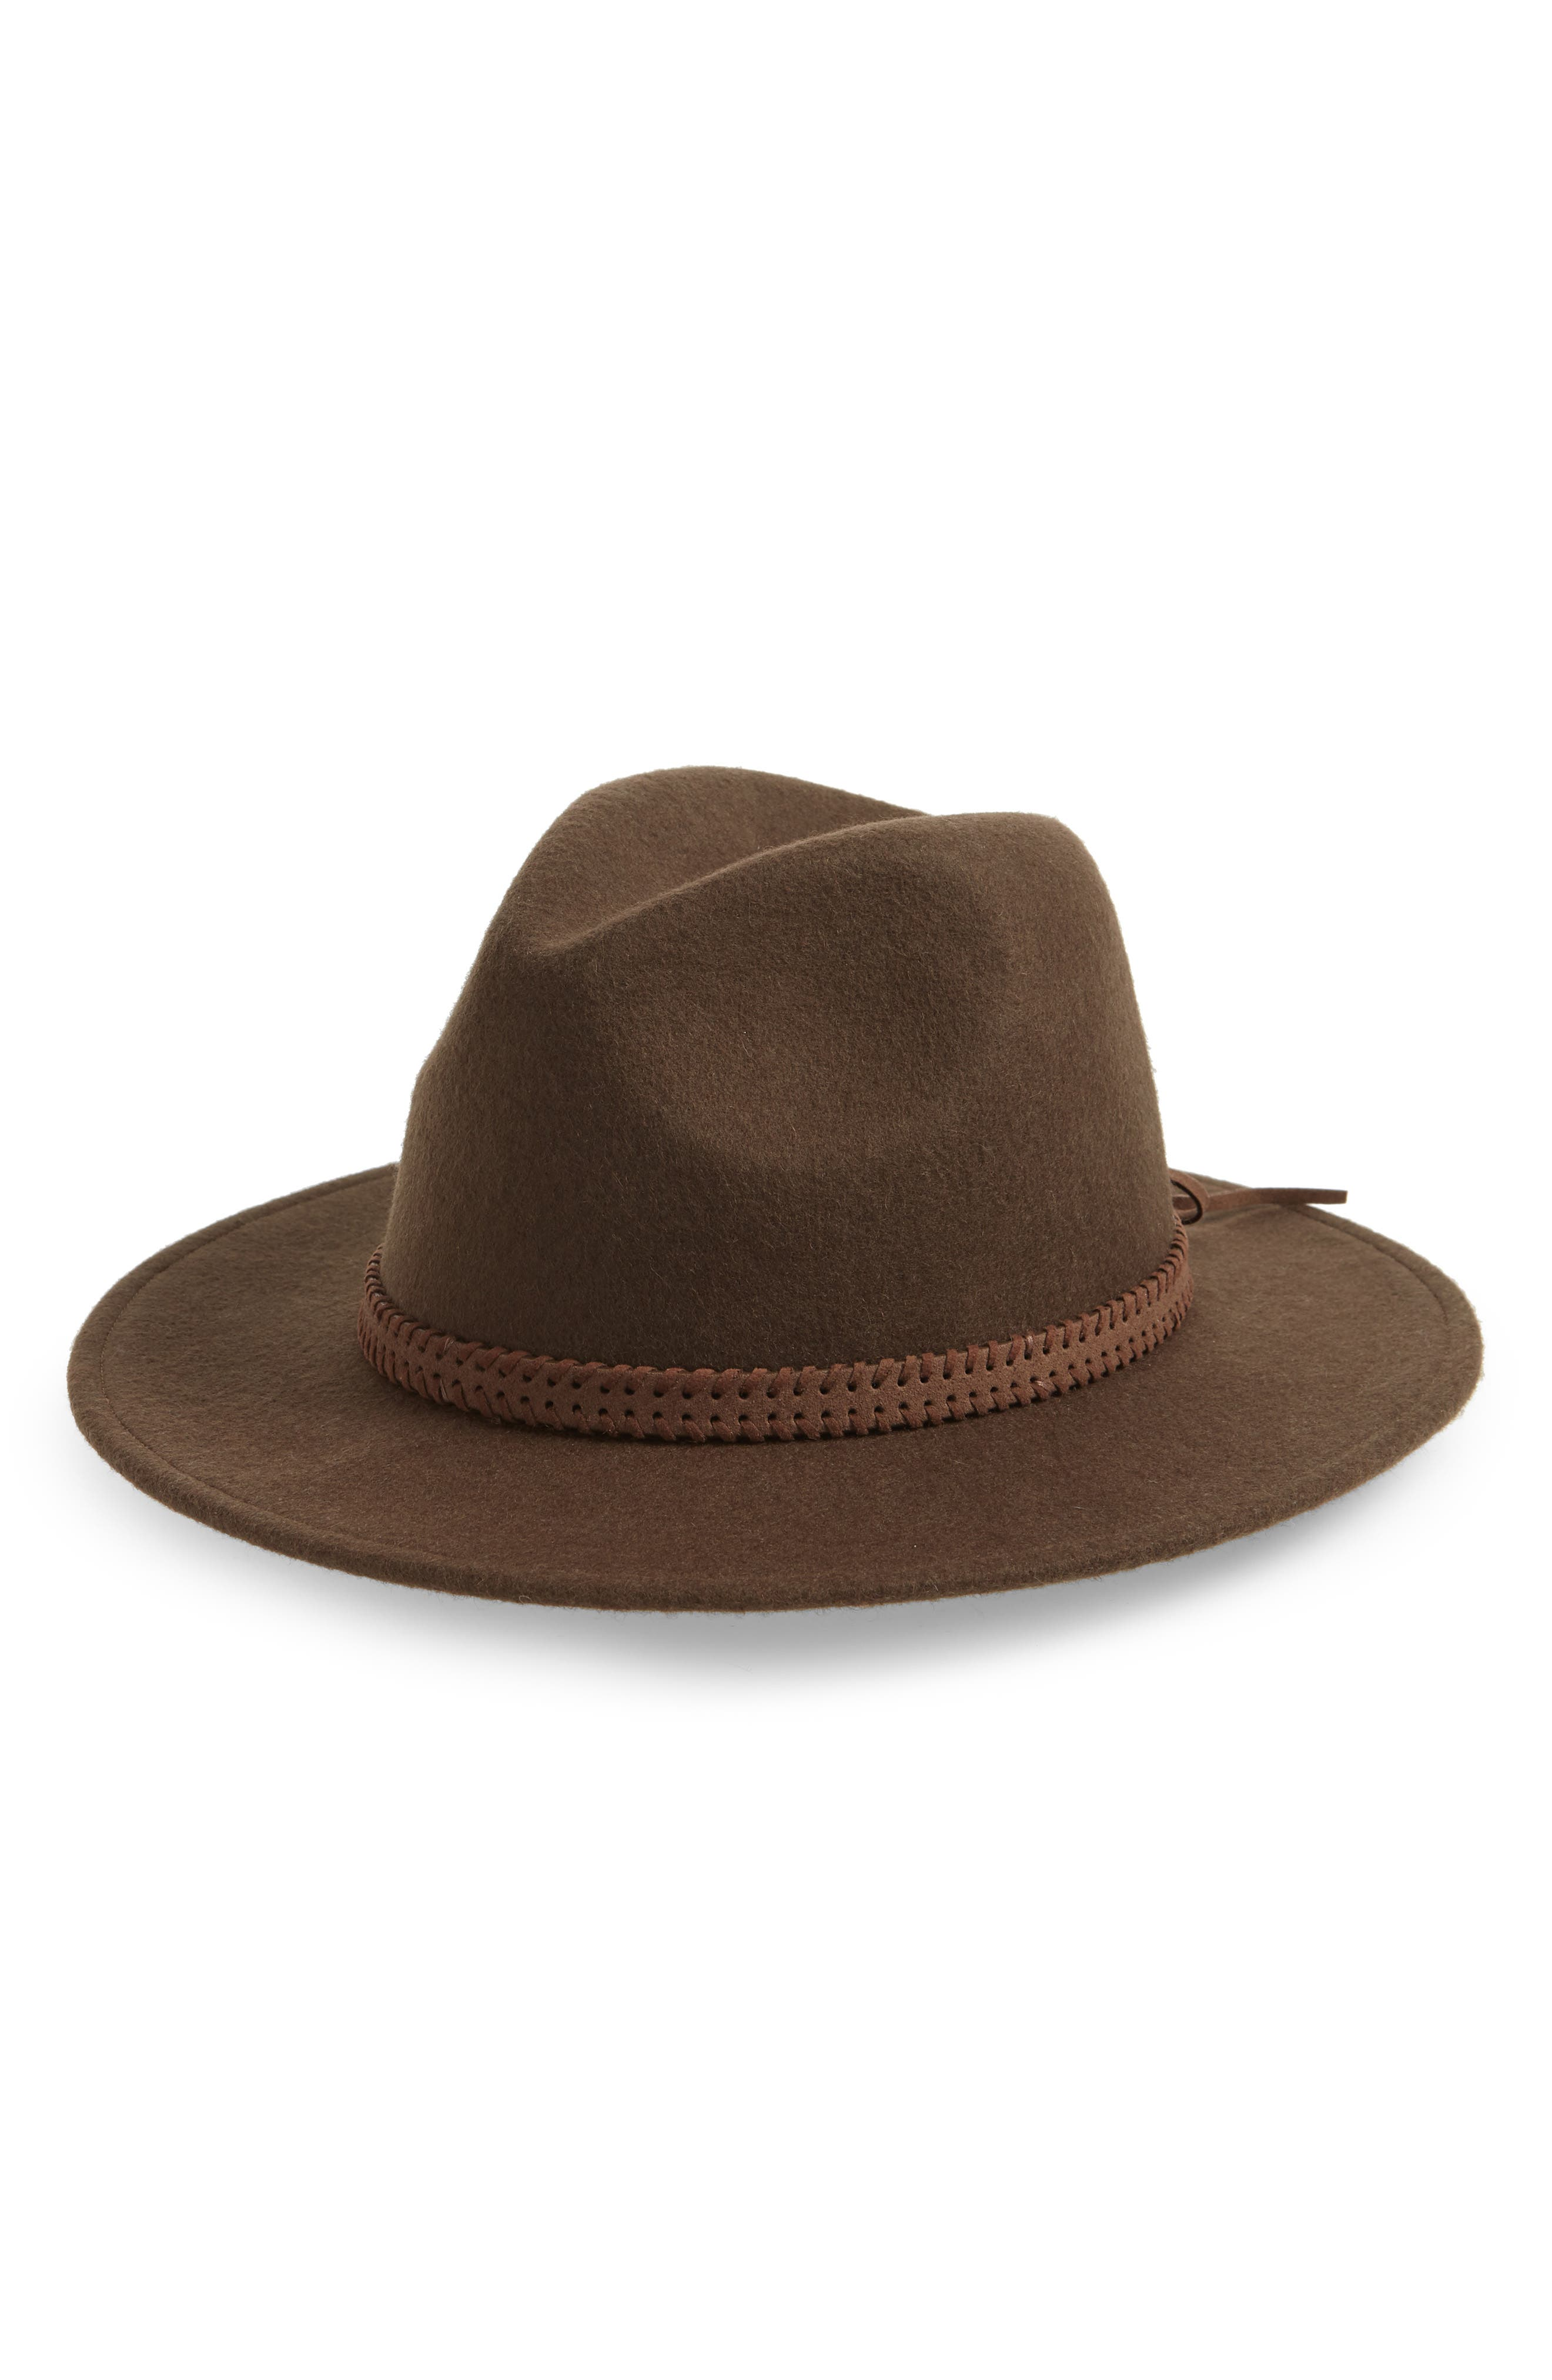 Felt Panama Hat,                             Main thumbnail 1, color,                             DARK TAUPE